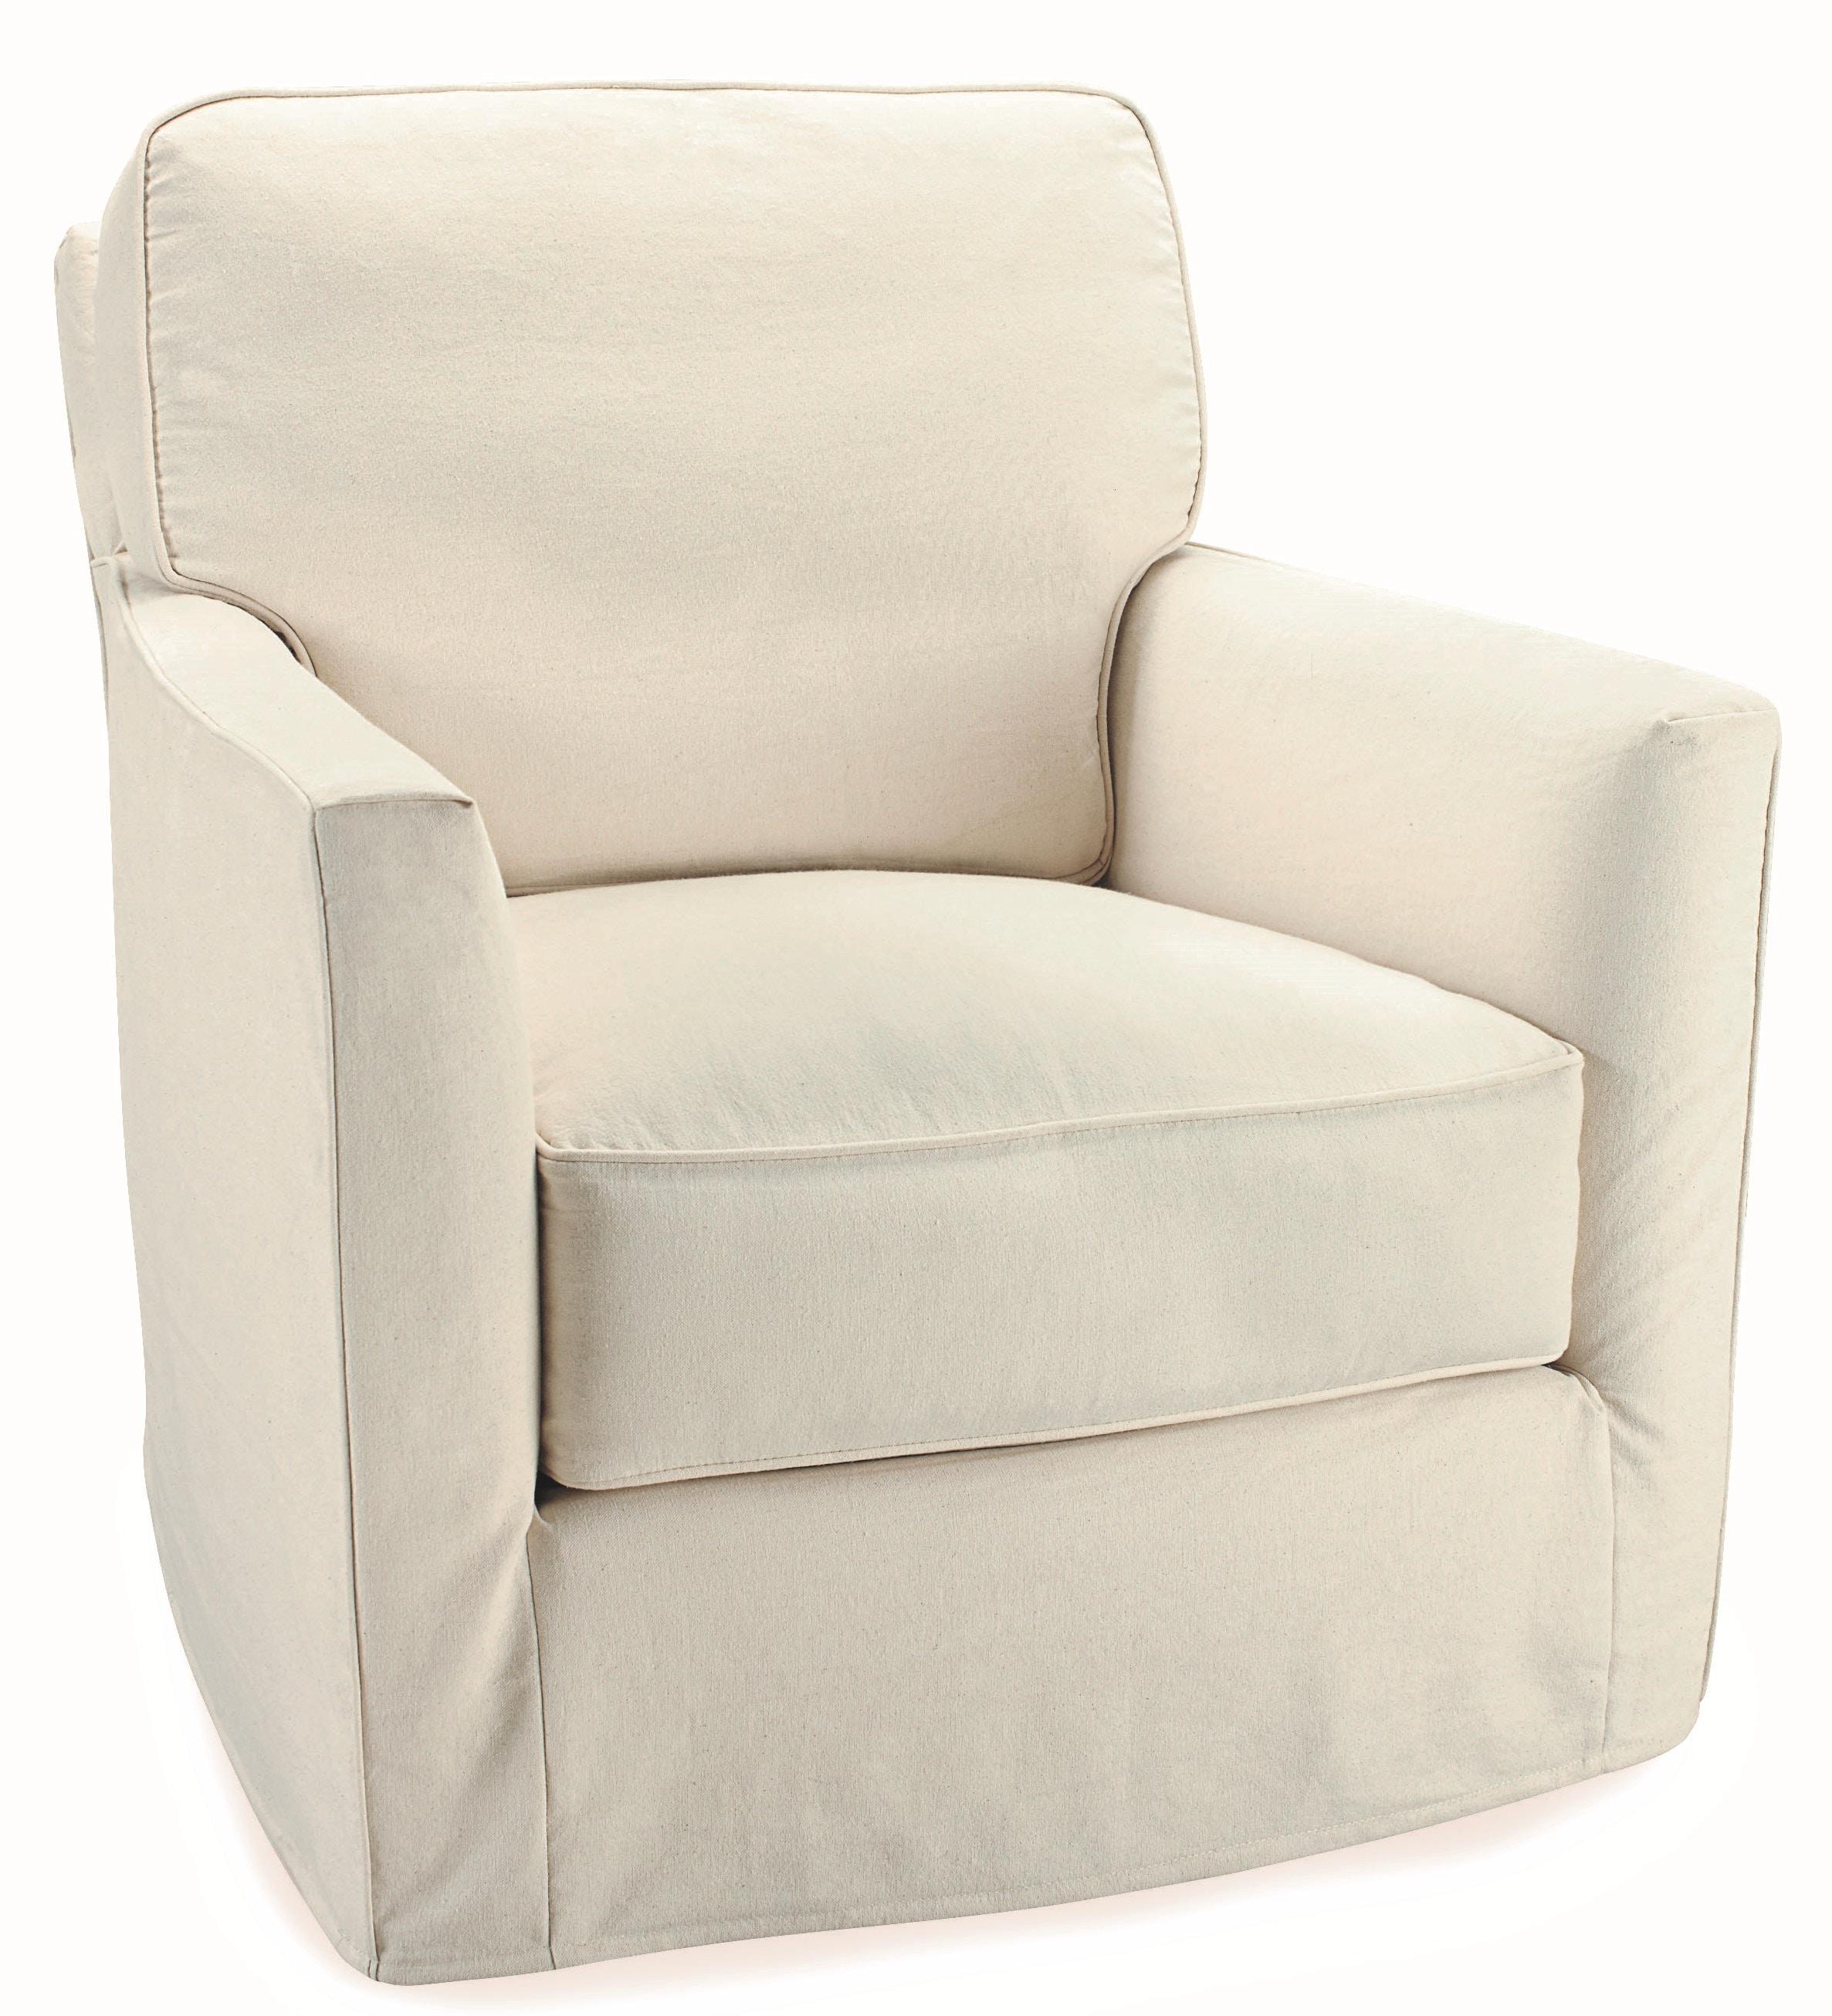 Lee Industries Slipcovered Swivel Chair C3121 01SW